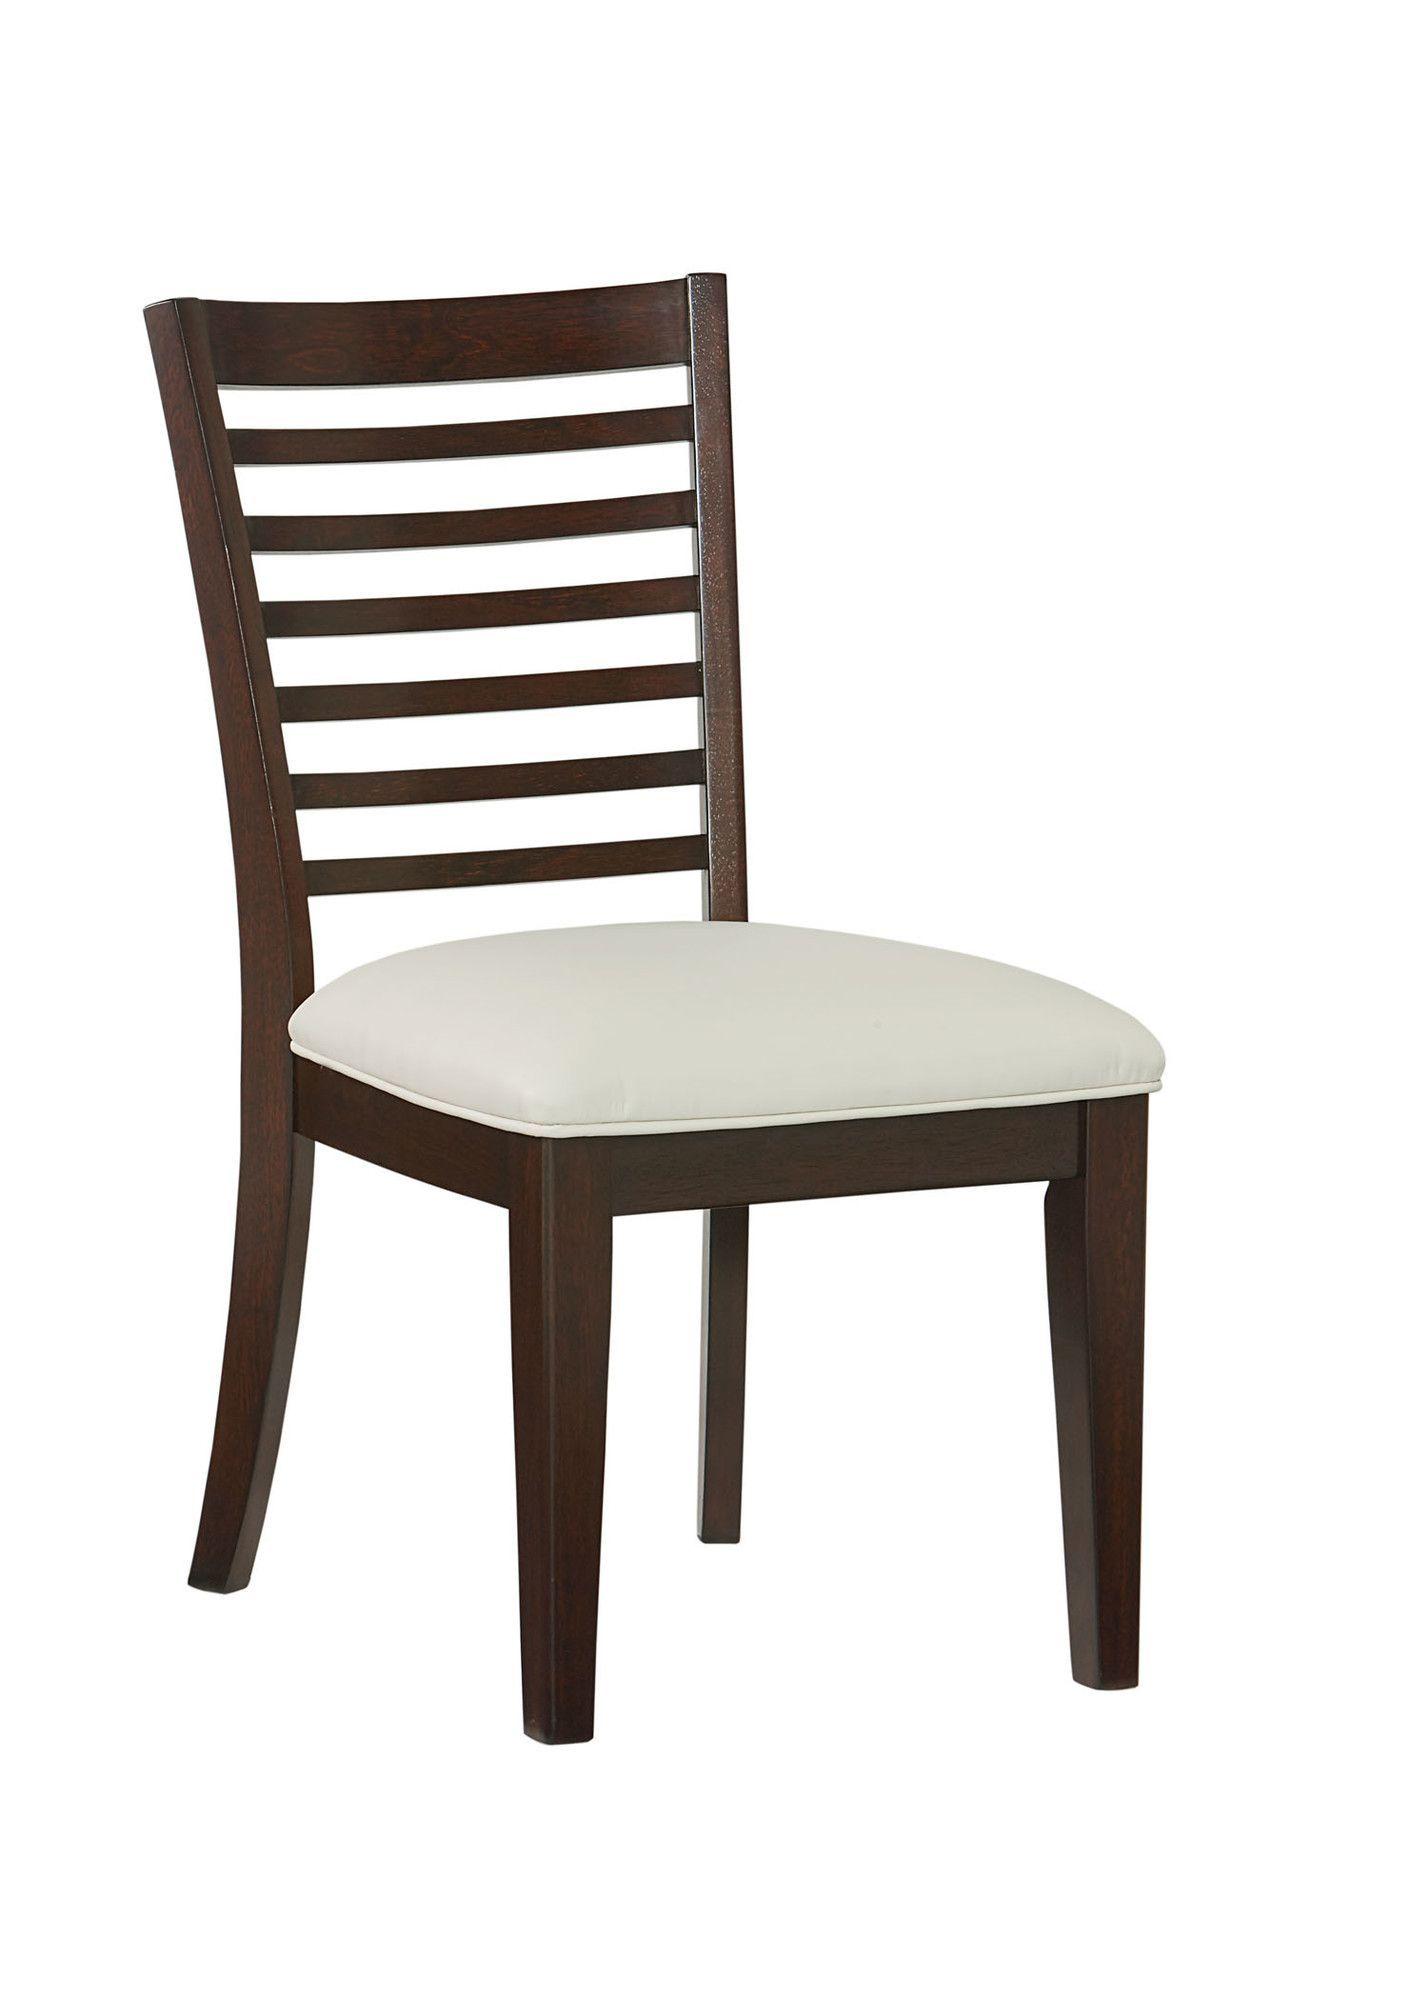 Noveau Side Chair Standard Furniture Side Chairs Furniture